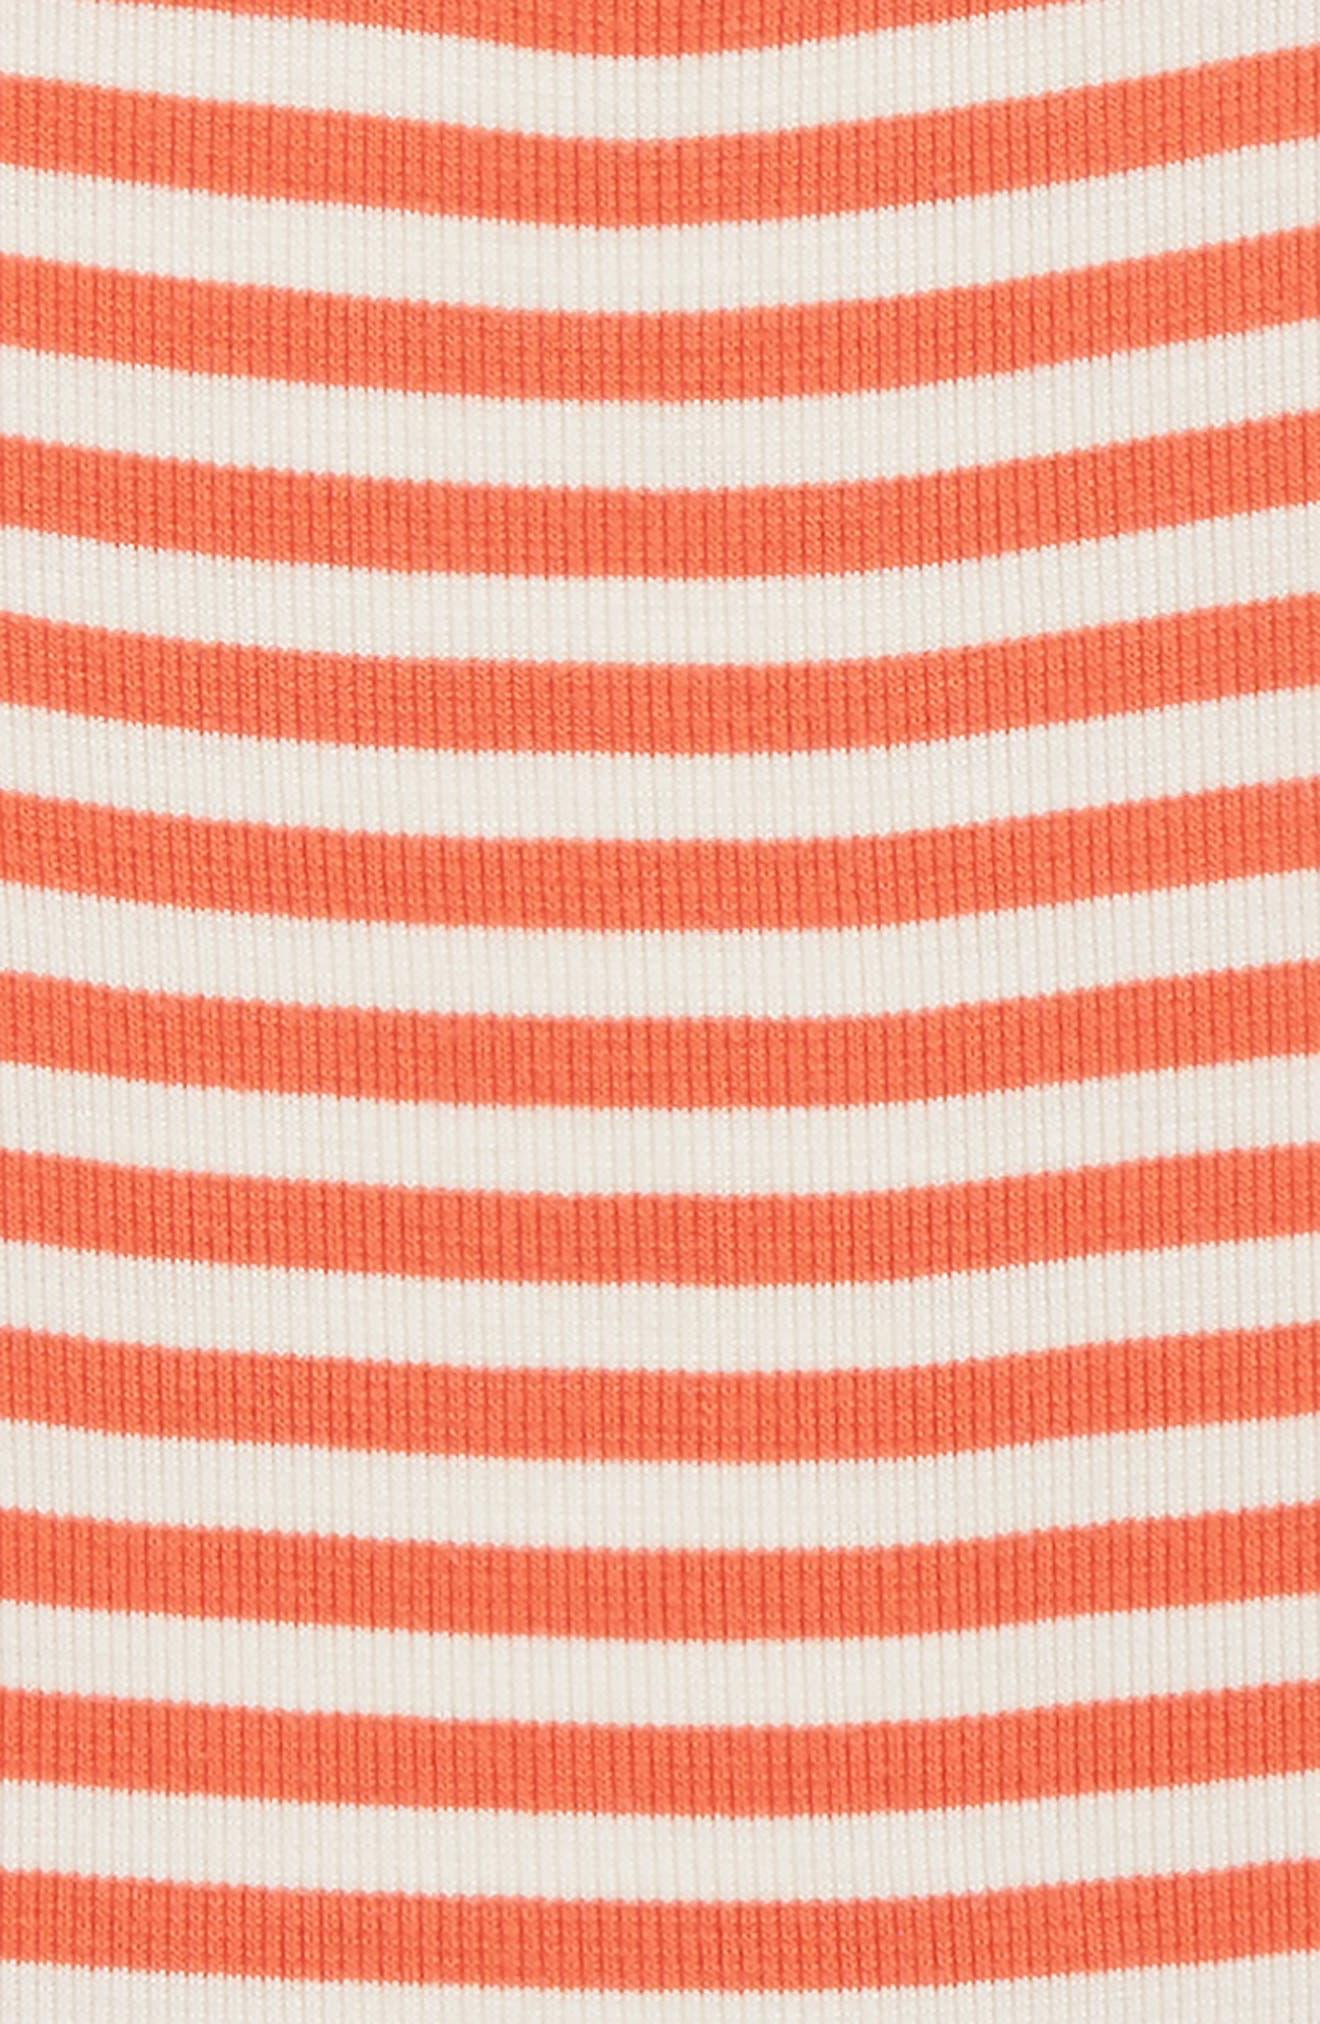 Crisscross Stripe Tank,                             Alternate thumbnail 2, color,                             Coral Hot- Ivory Stripe